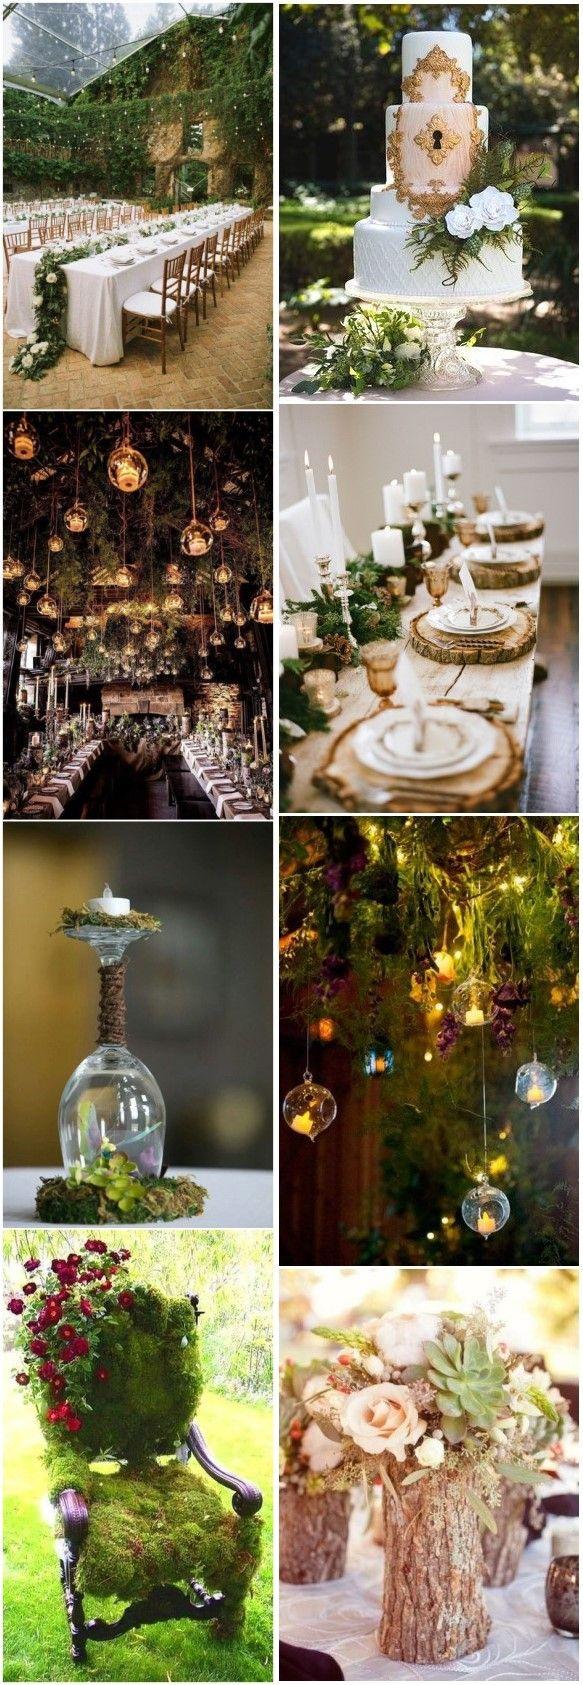 20+ Enchanted Forest Wedding Themed Ideas #weddings